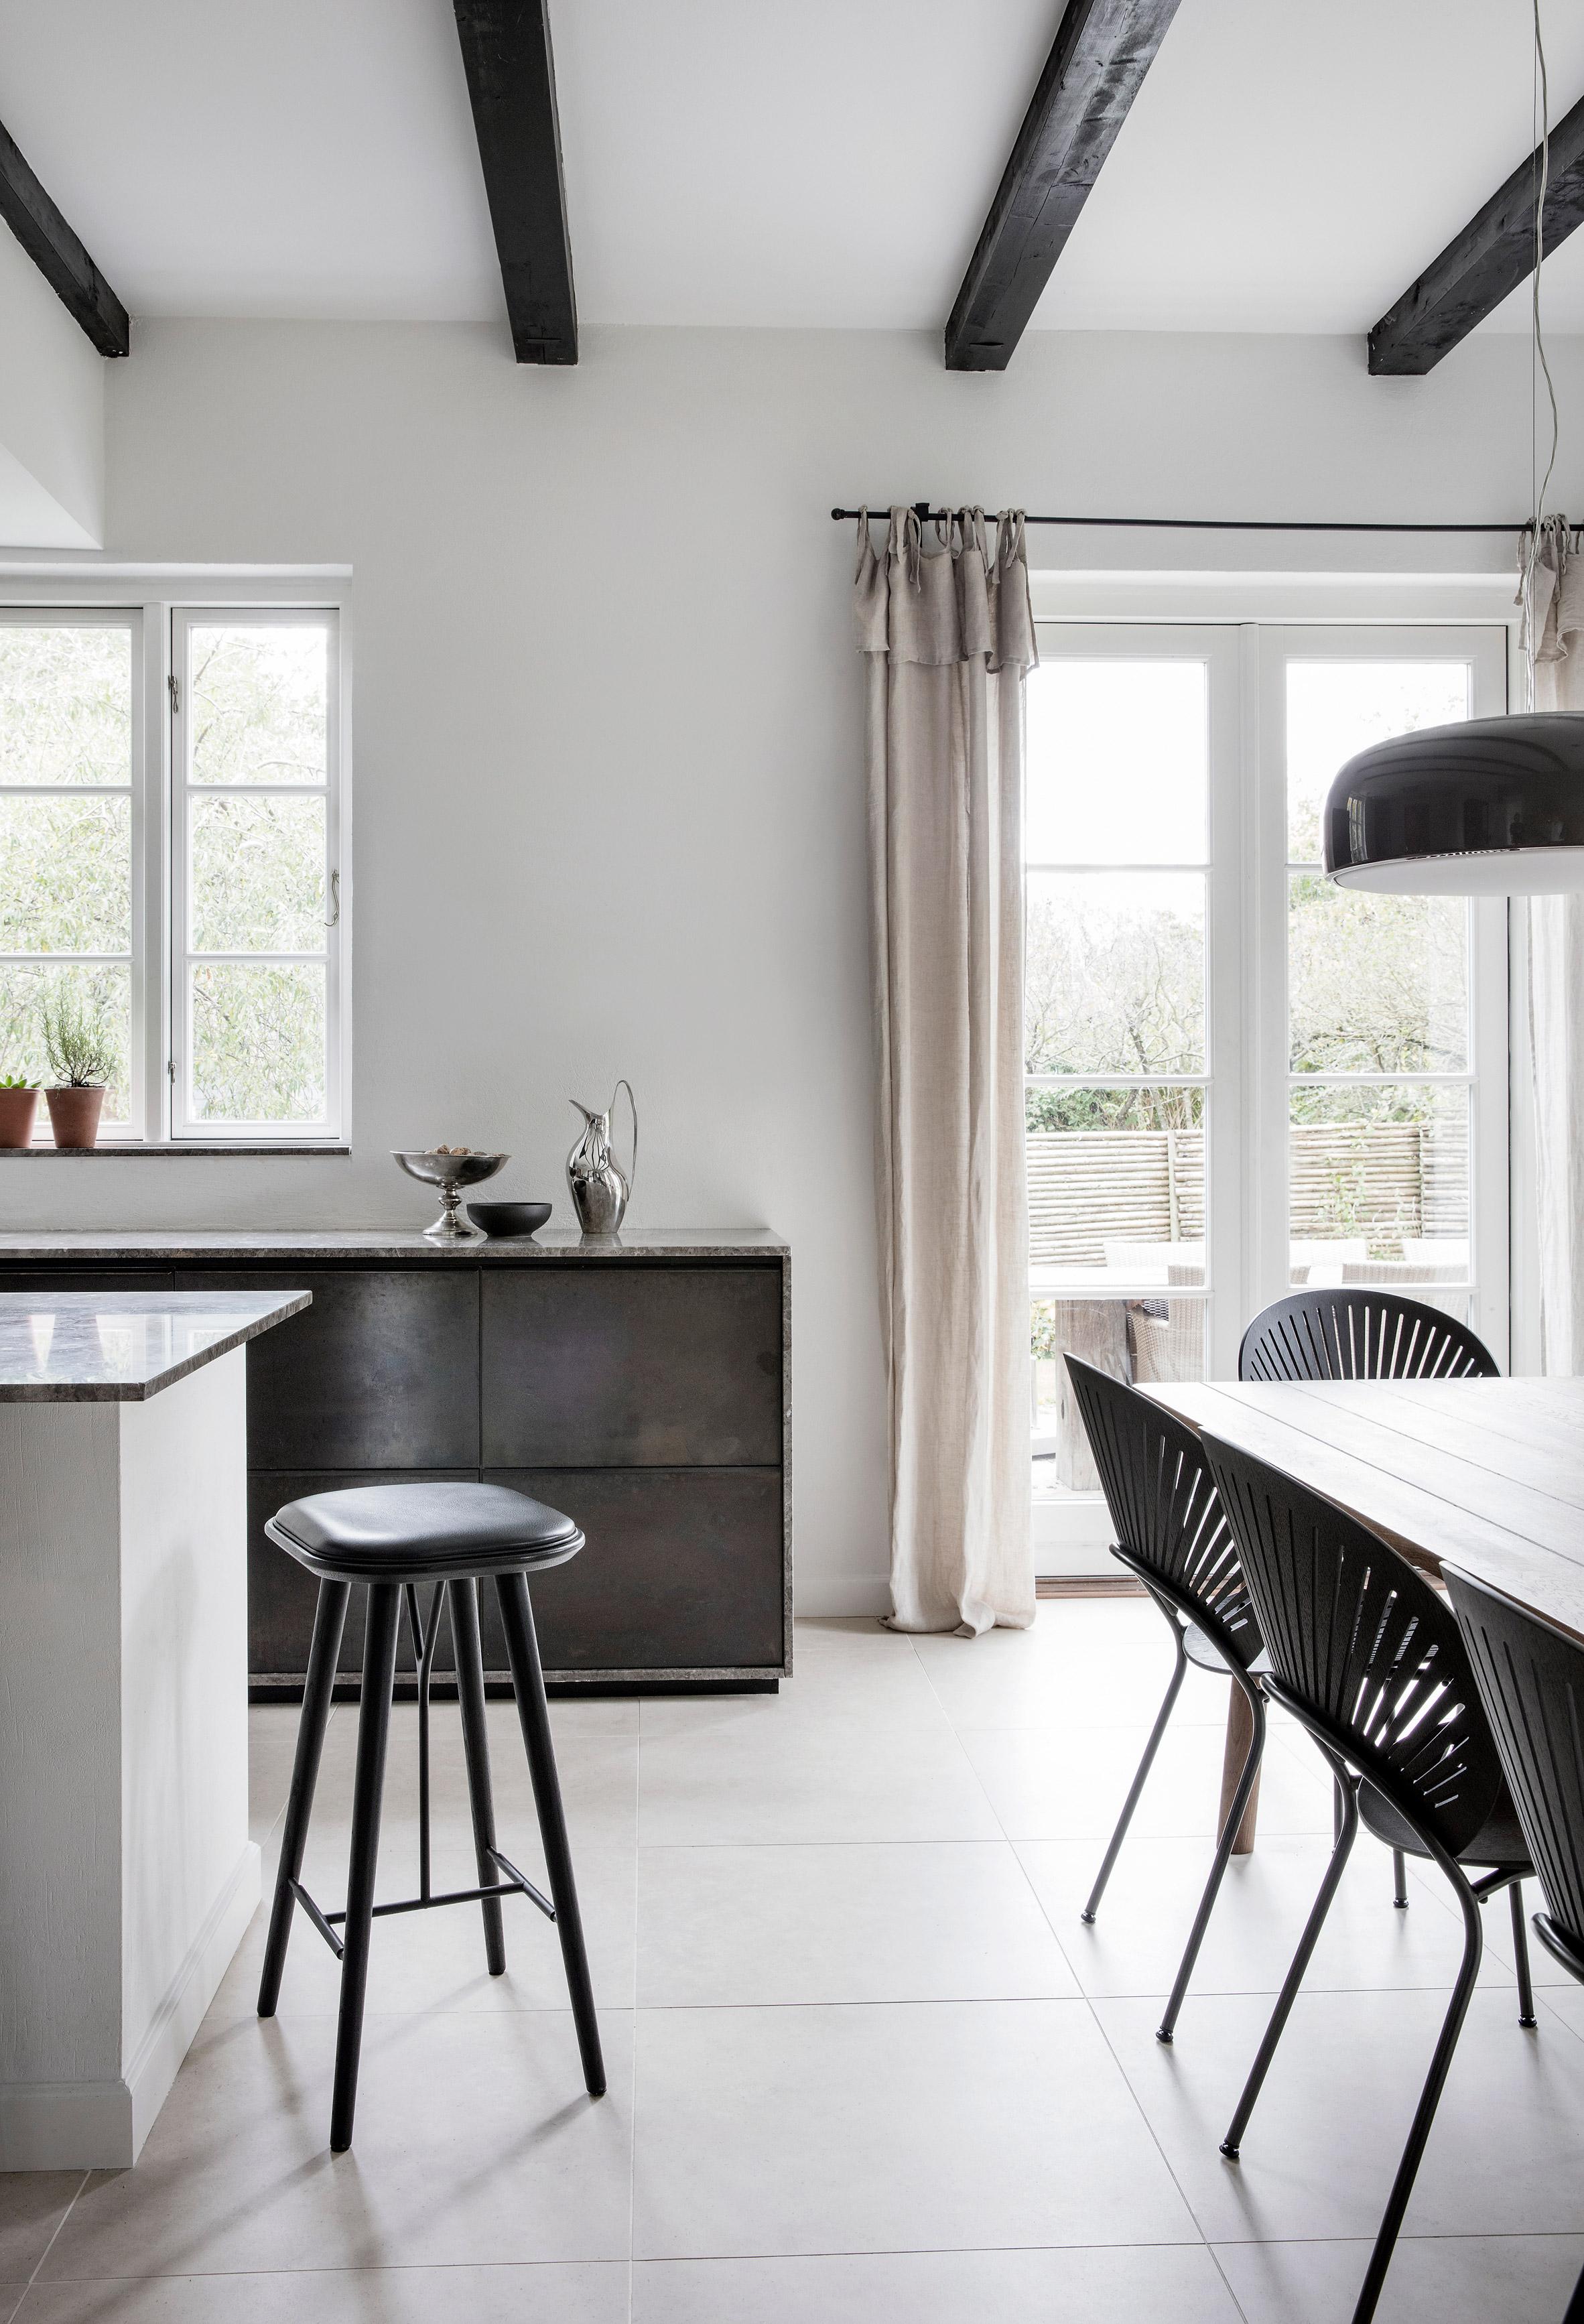 elledecoration vn nhà màu trung tính kaja-moller-home-fredericia-interiors-residential-copenhagen 3